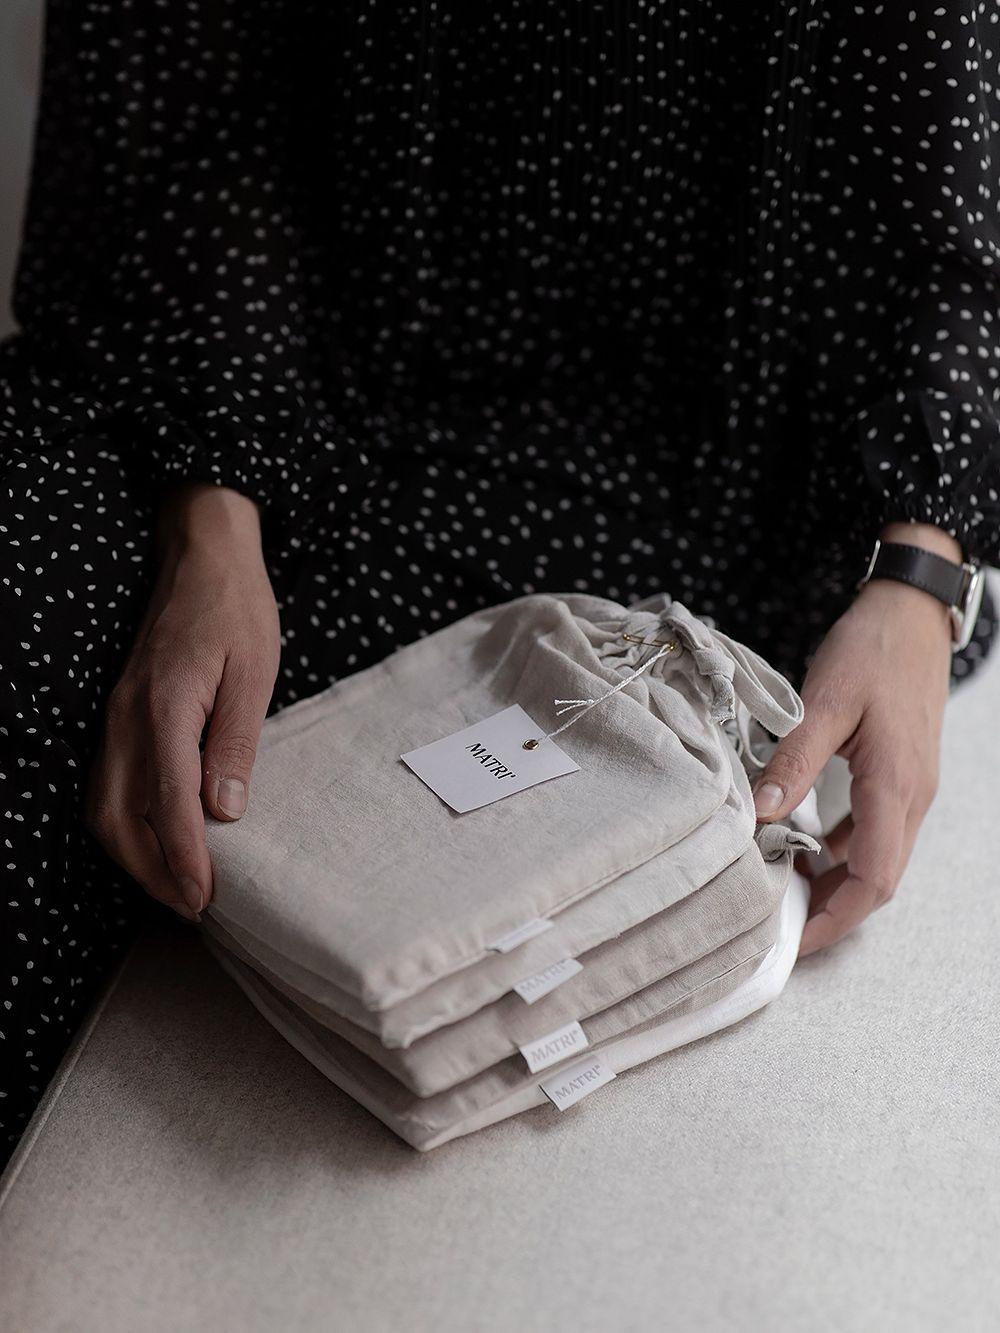 Matri pillowcases